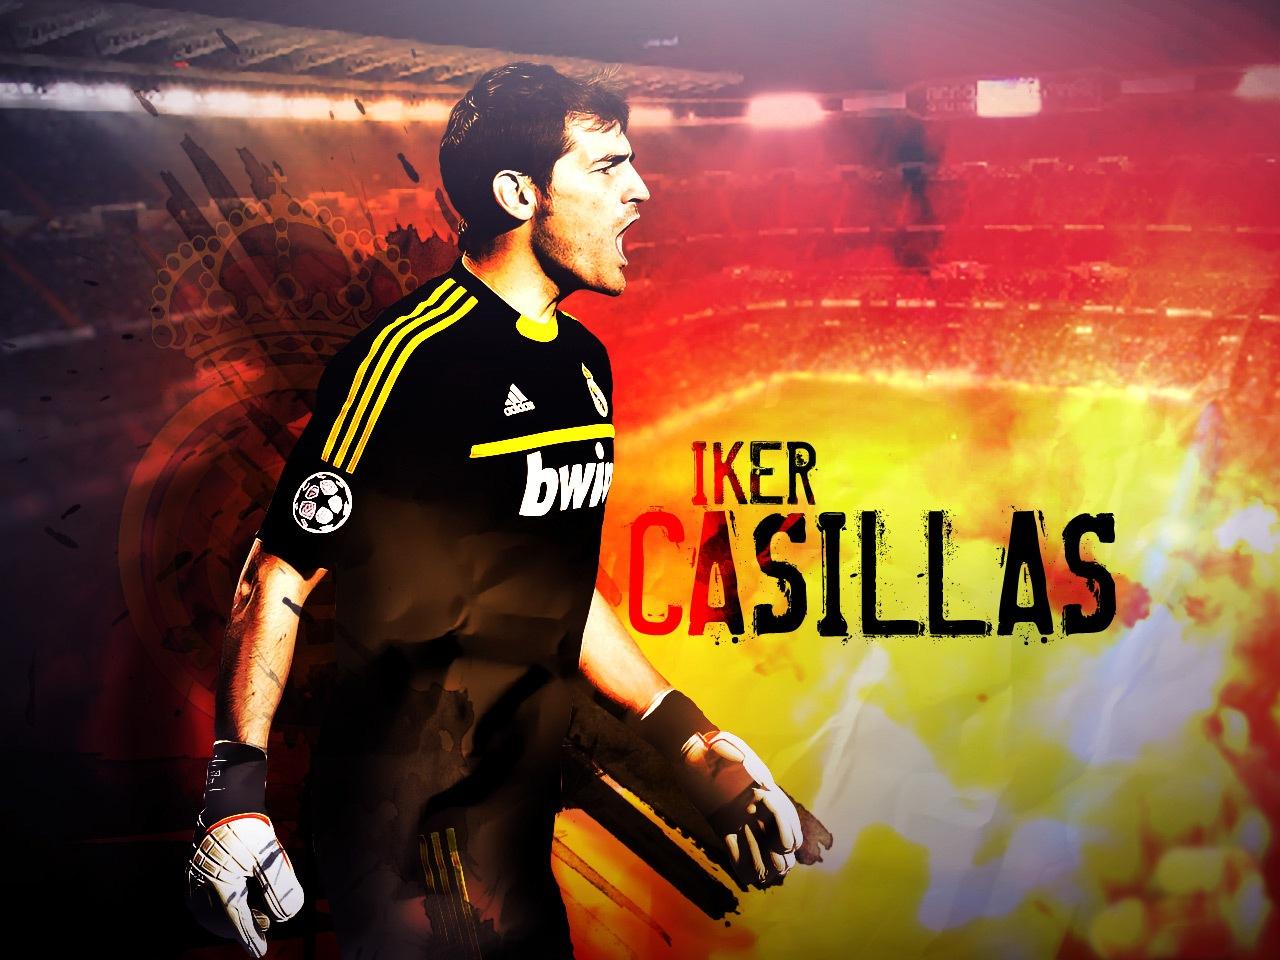 Hot Babes Single Iker Casillas Hd Wallpapers 2012-2013-7515